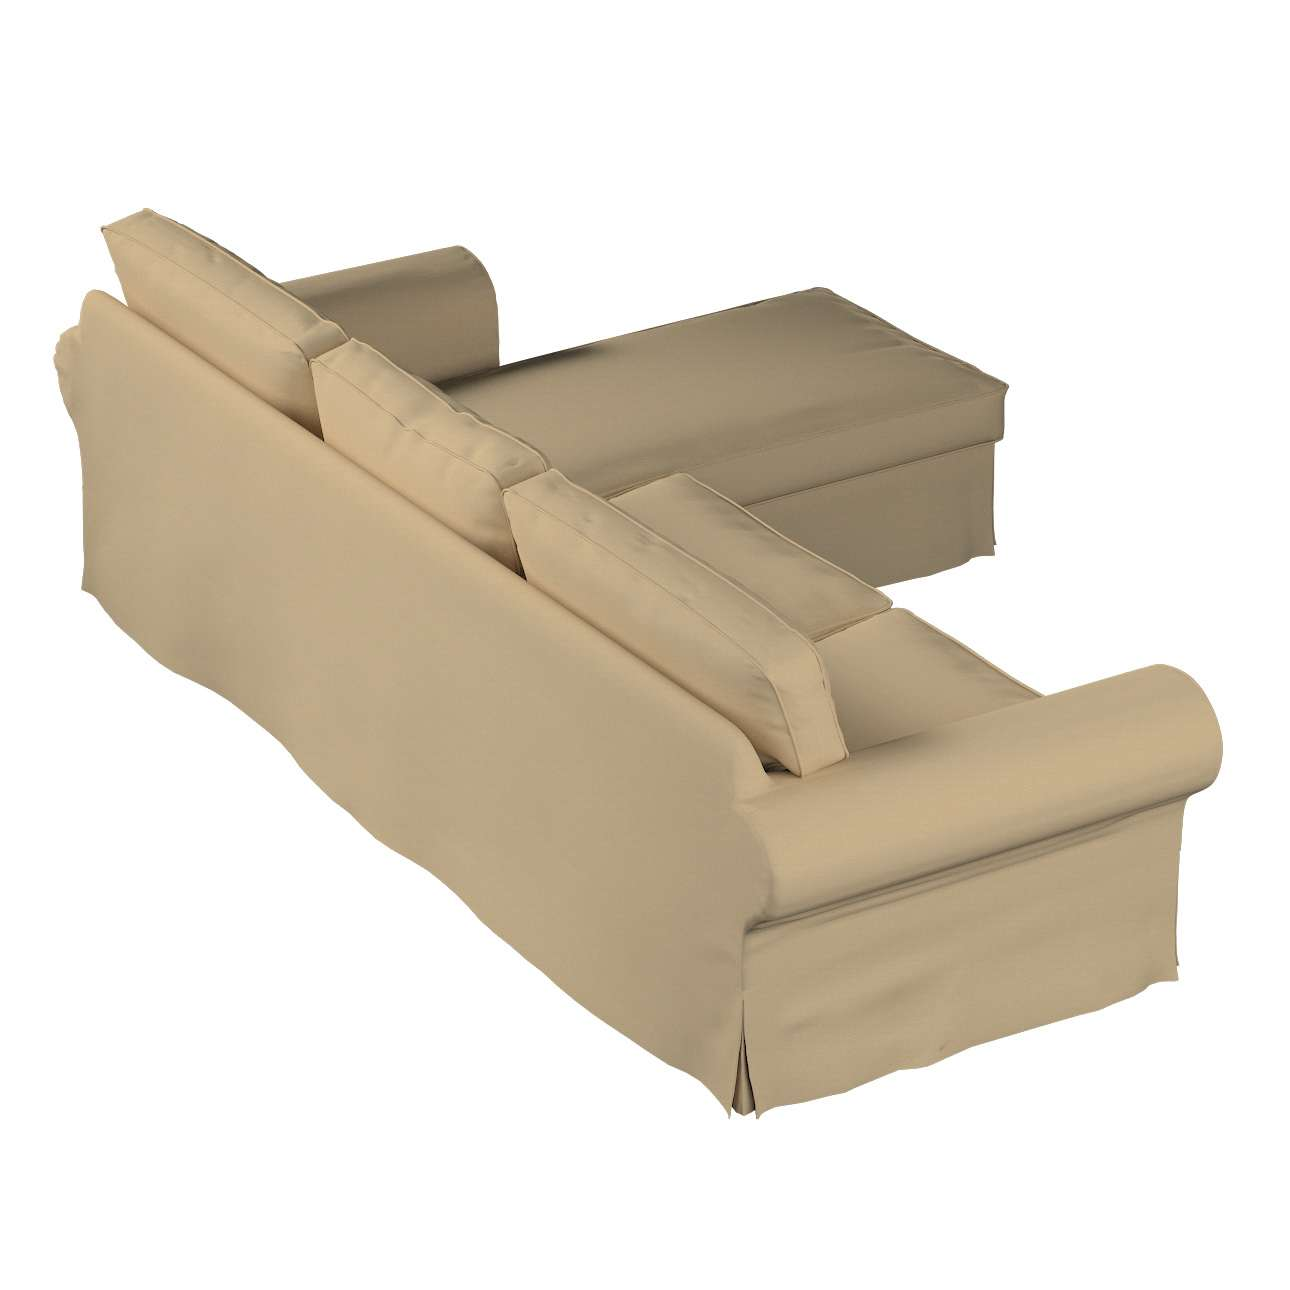 Ektorp 2-Sitzer Sofabezug mit Recamiere Ektorp 2-Sitzer Sofabezug mit Recamiere von der Kollektion Cotton Panama, Stoff: 702-01